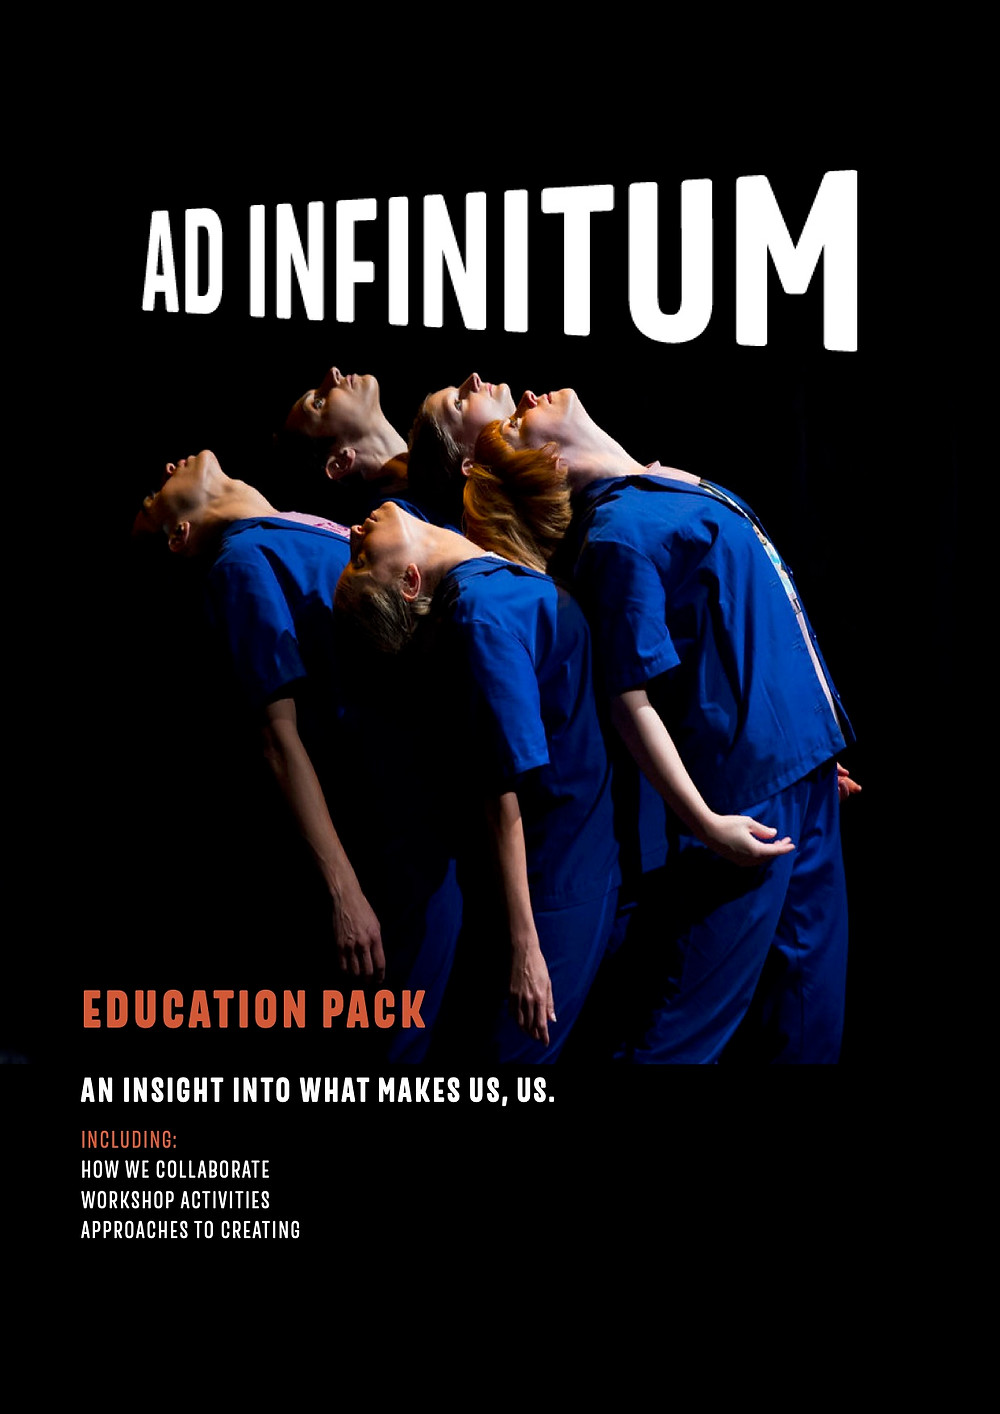 Ad Infinitum Education Pack, written by Kieran Burgess